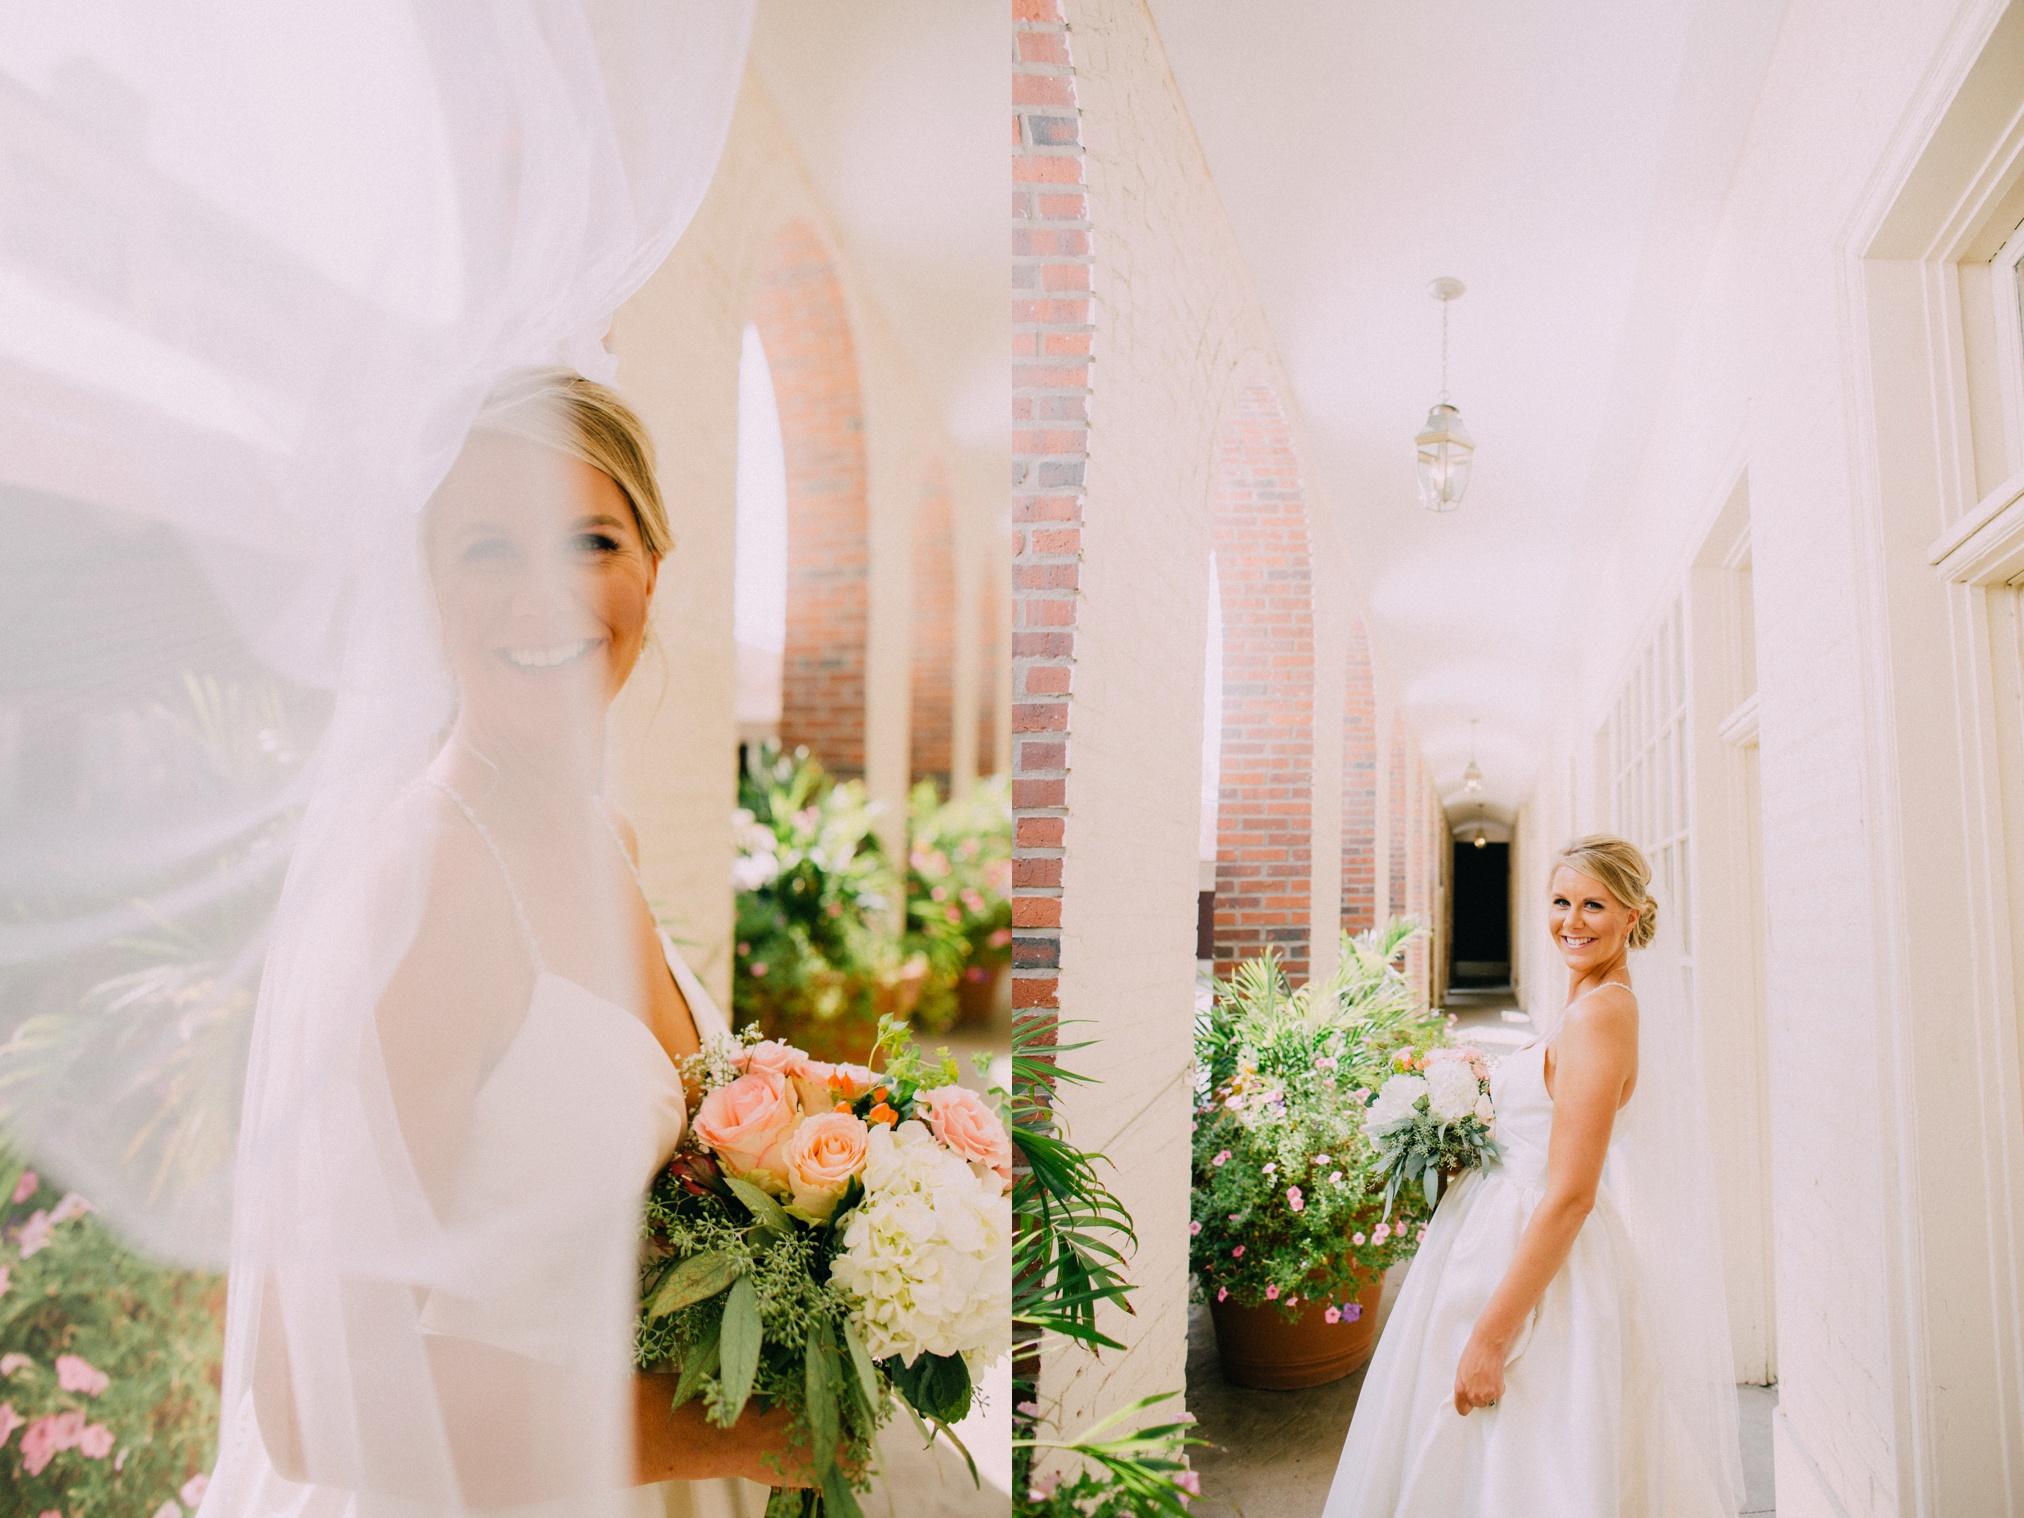 brenna+michael_wedding-215.jpg